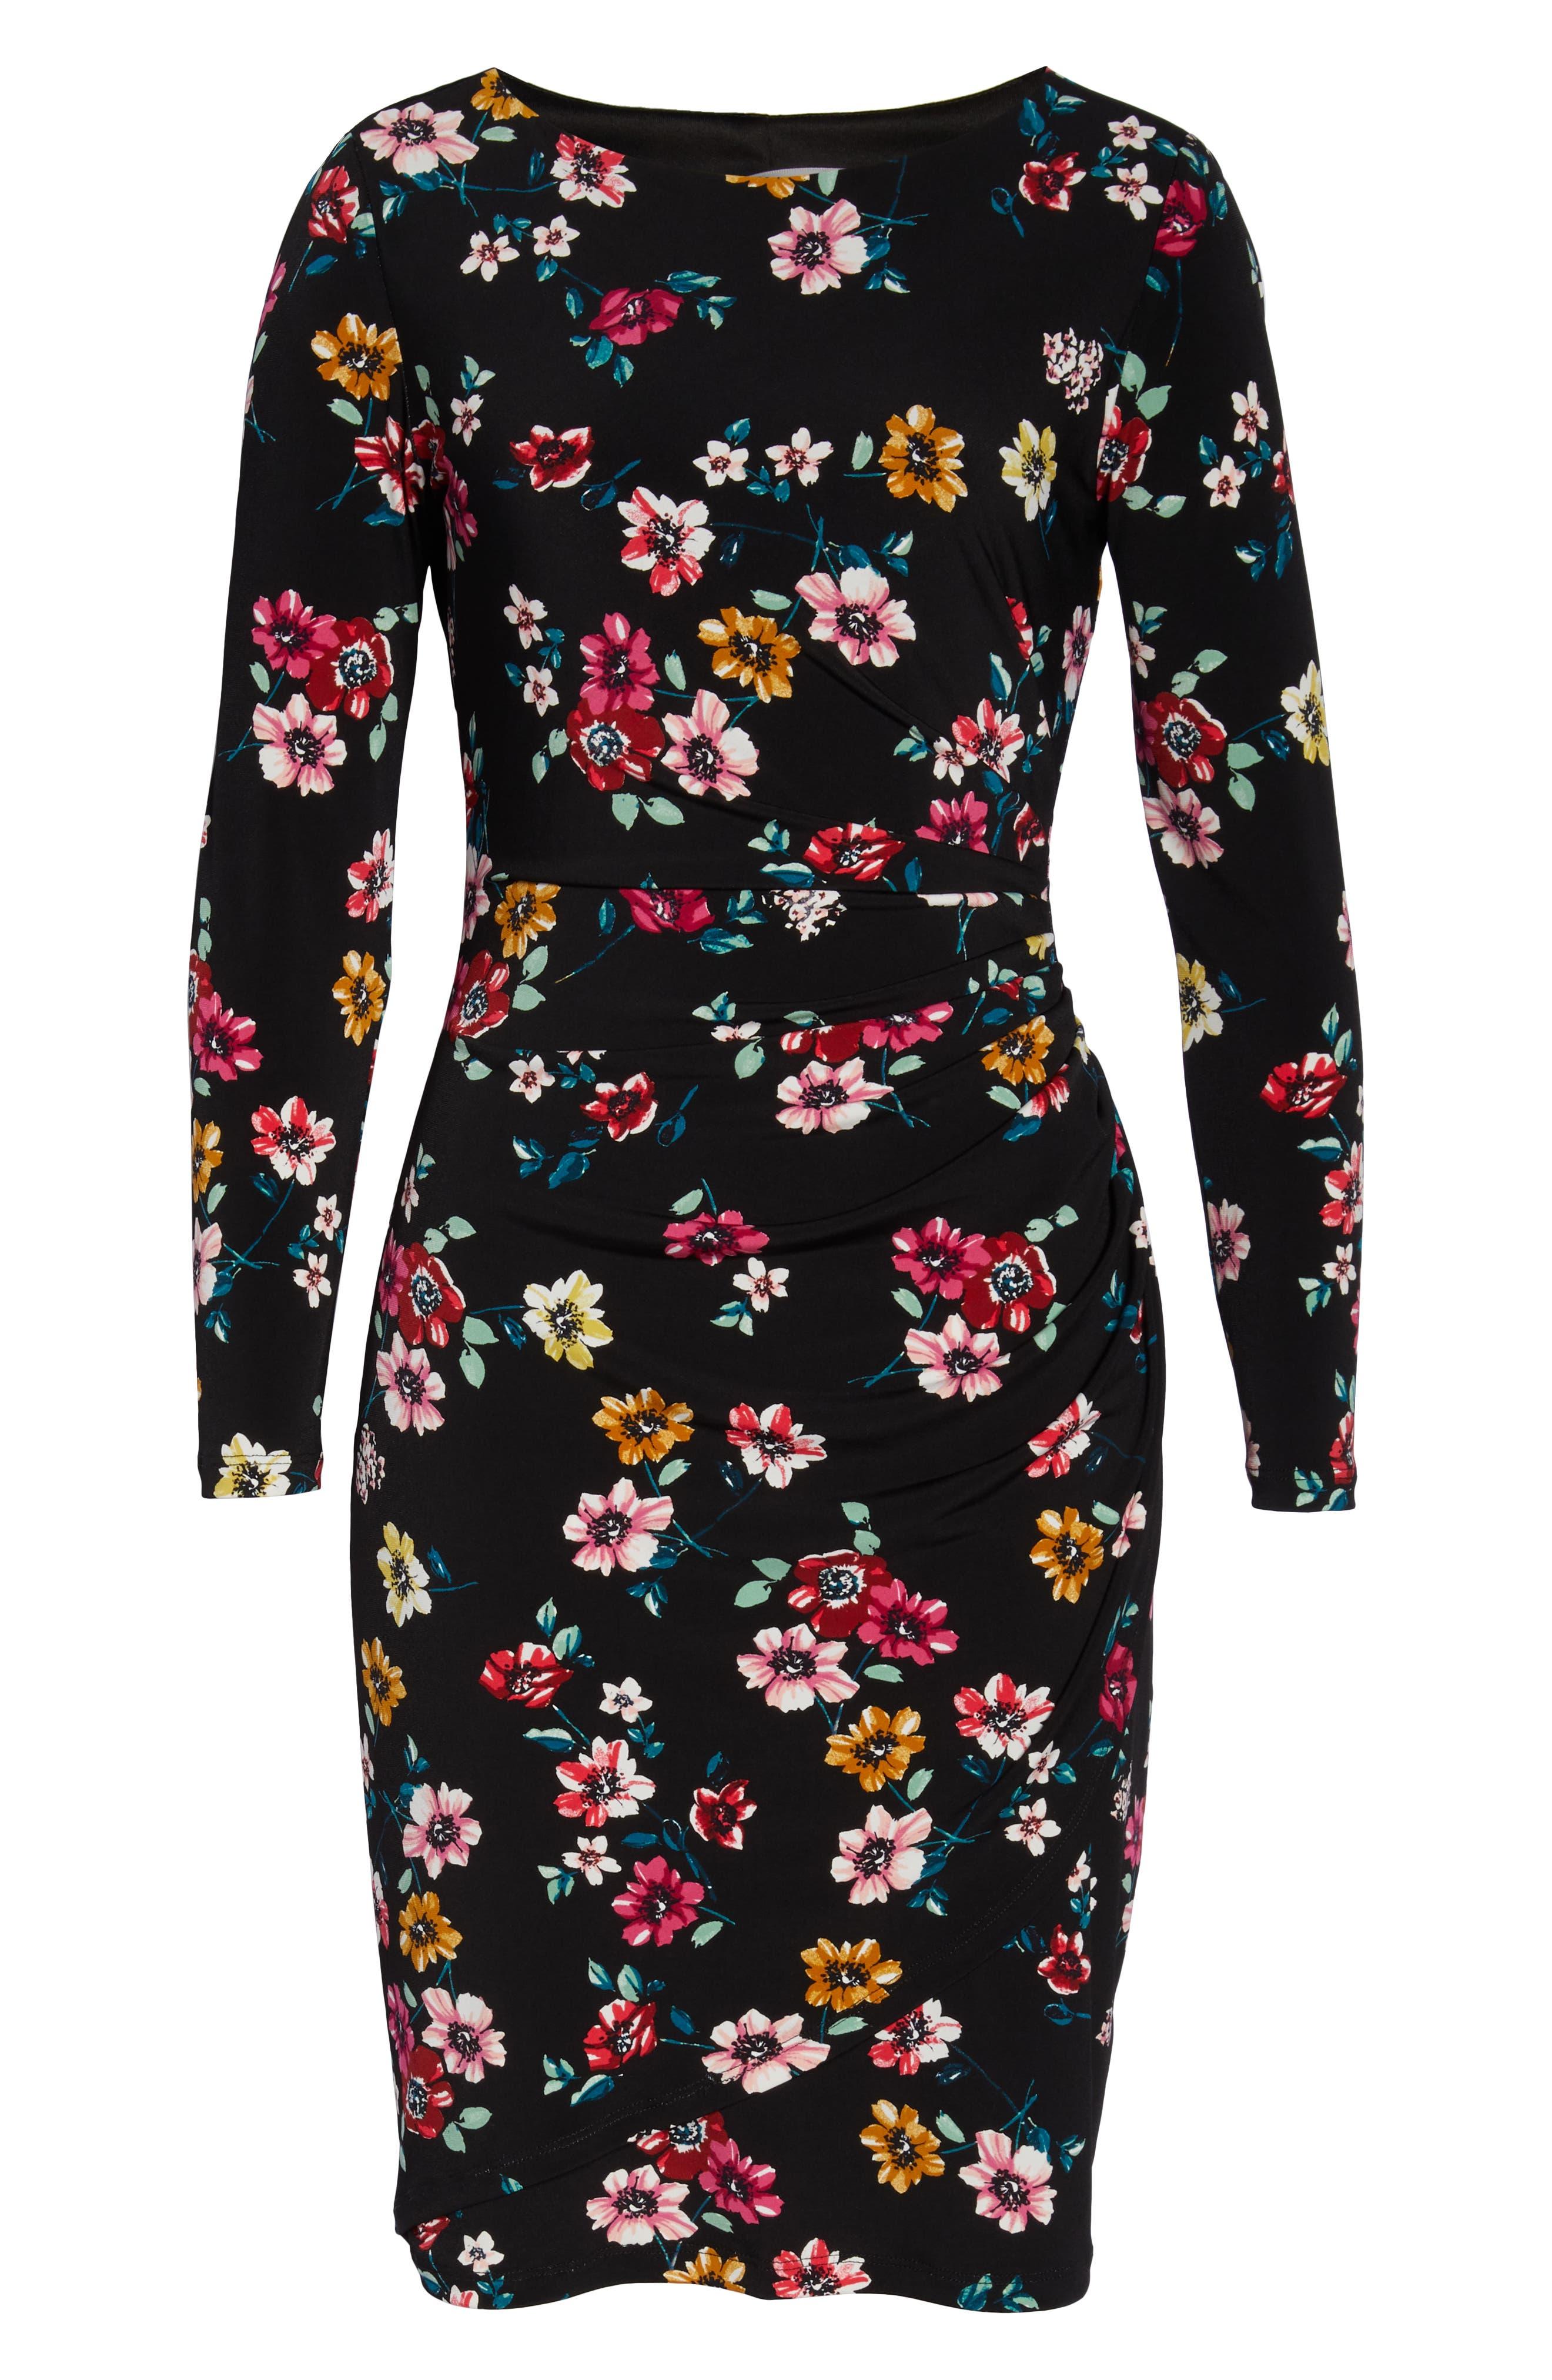 ELIZA J, Floral Sheath Dress, Alternate thumbnail 7, color, 001